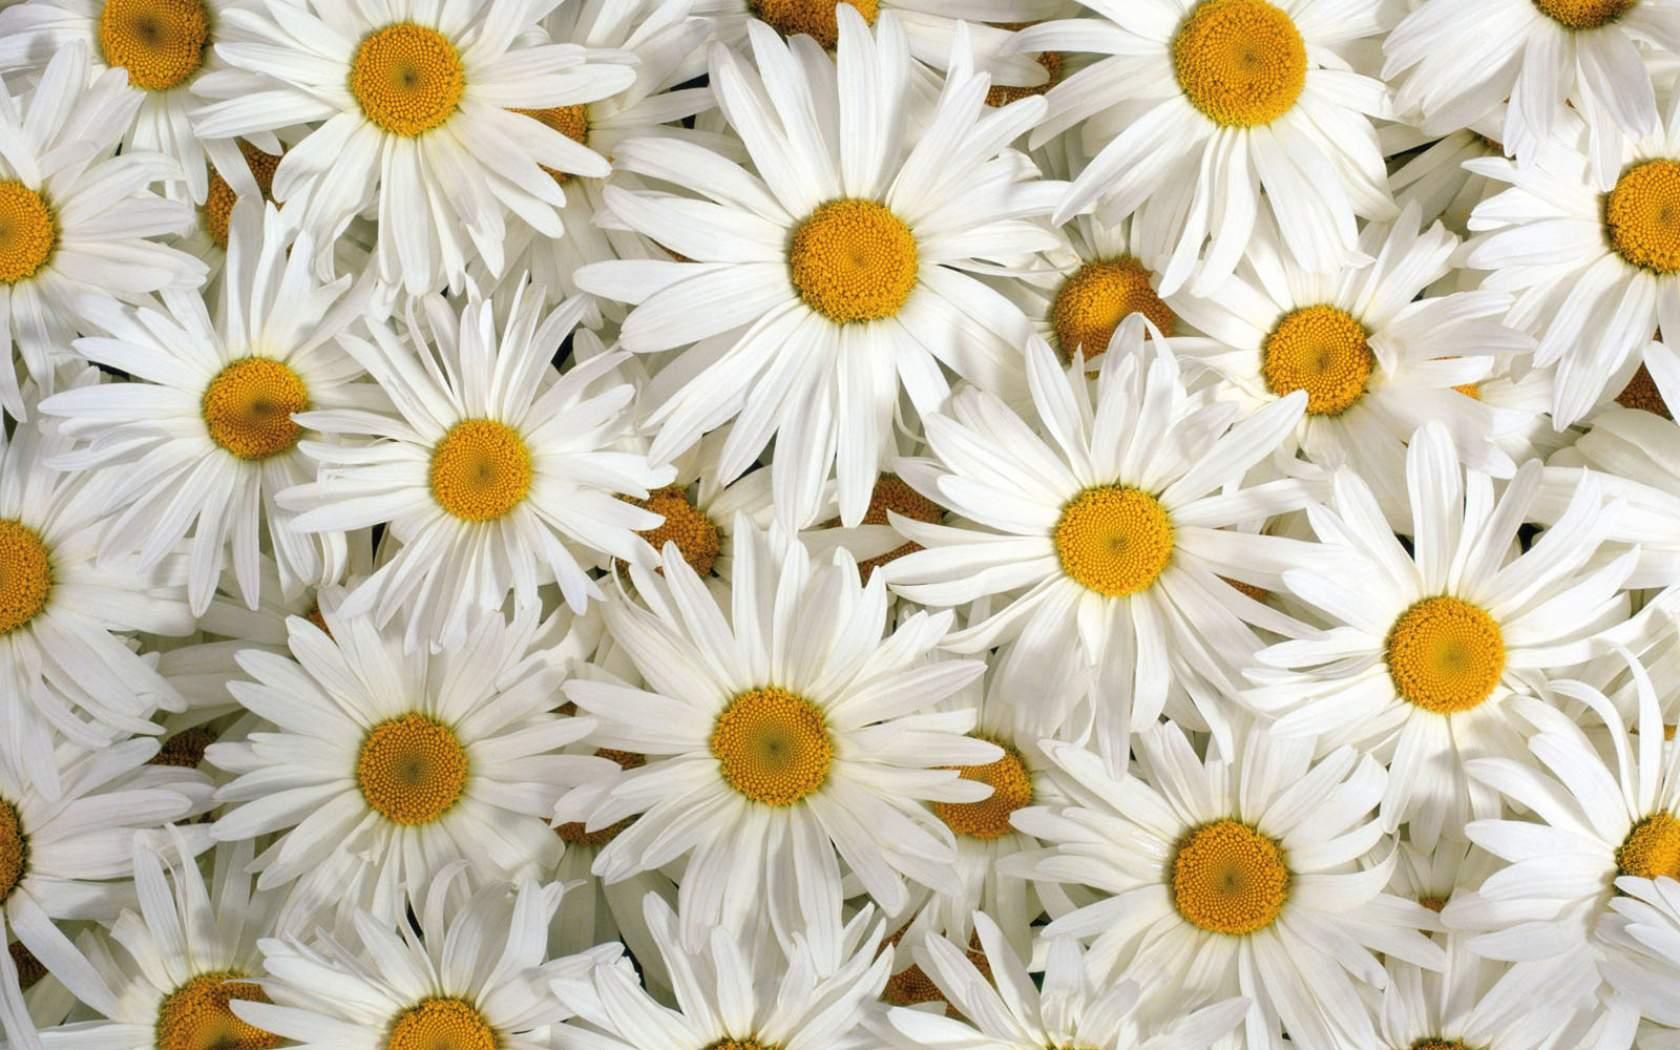 Flower Tumblr HD Wallpaper